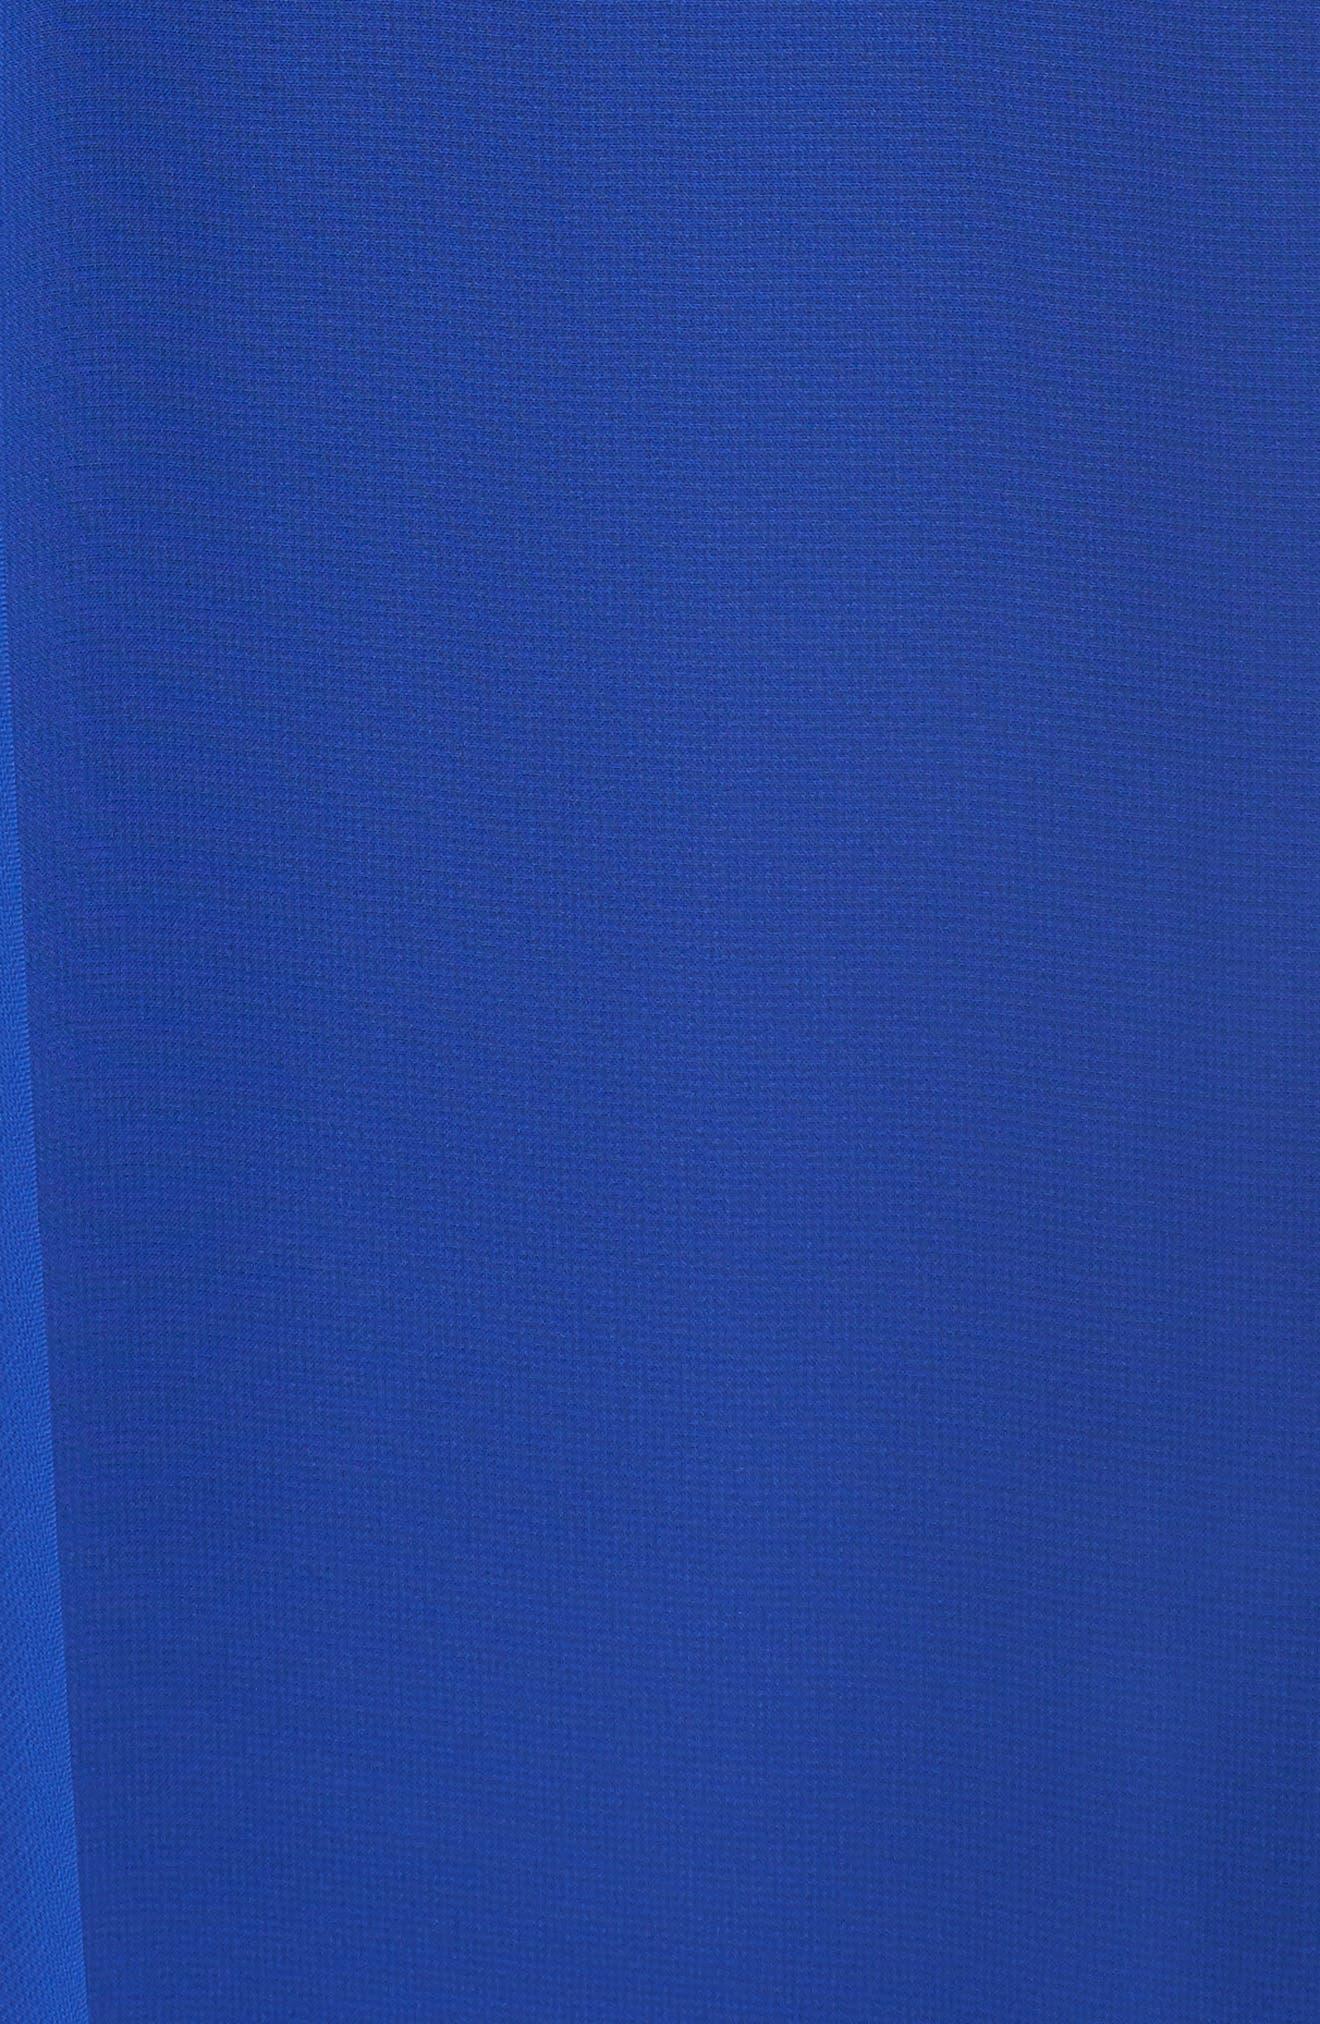 Embellished Trapeze Dress,                             Alternate thumbnail 5, color,                             430